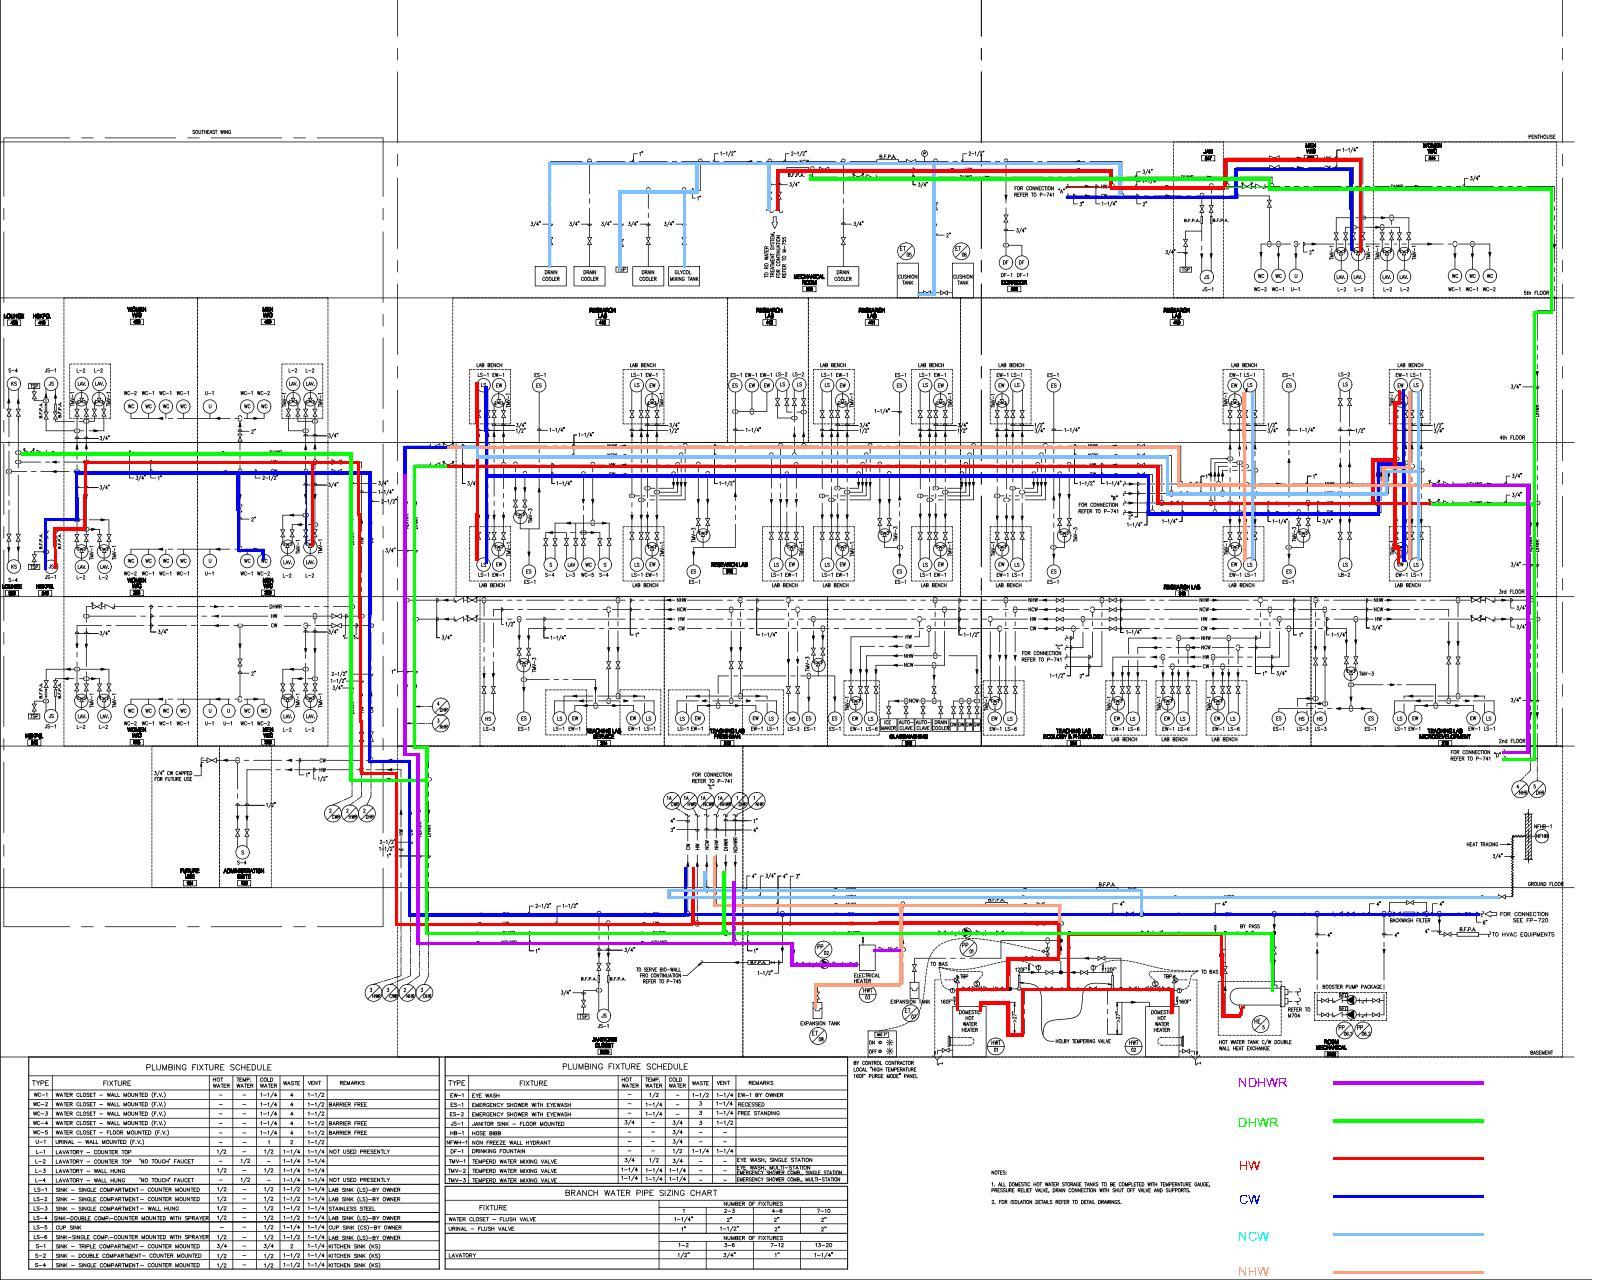 plumbing sanitary riser diagram xbox 360 circuit constantine papadakis integrated sciences building